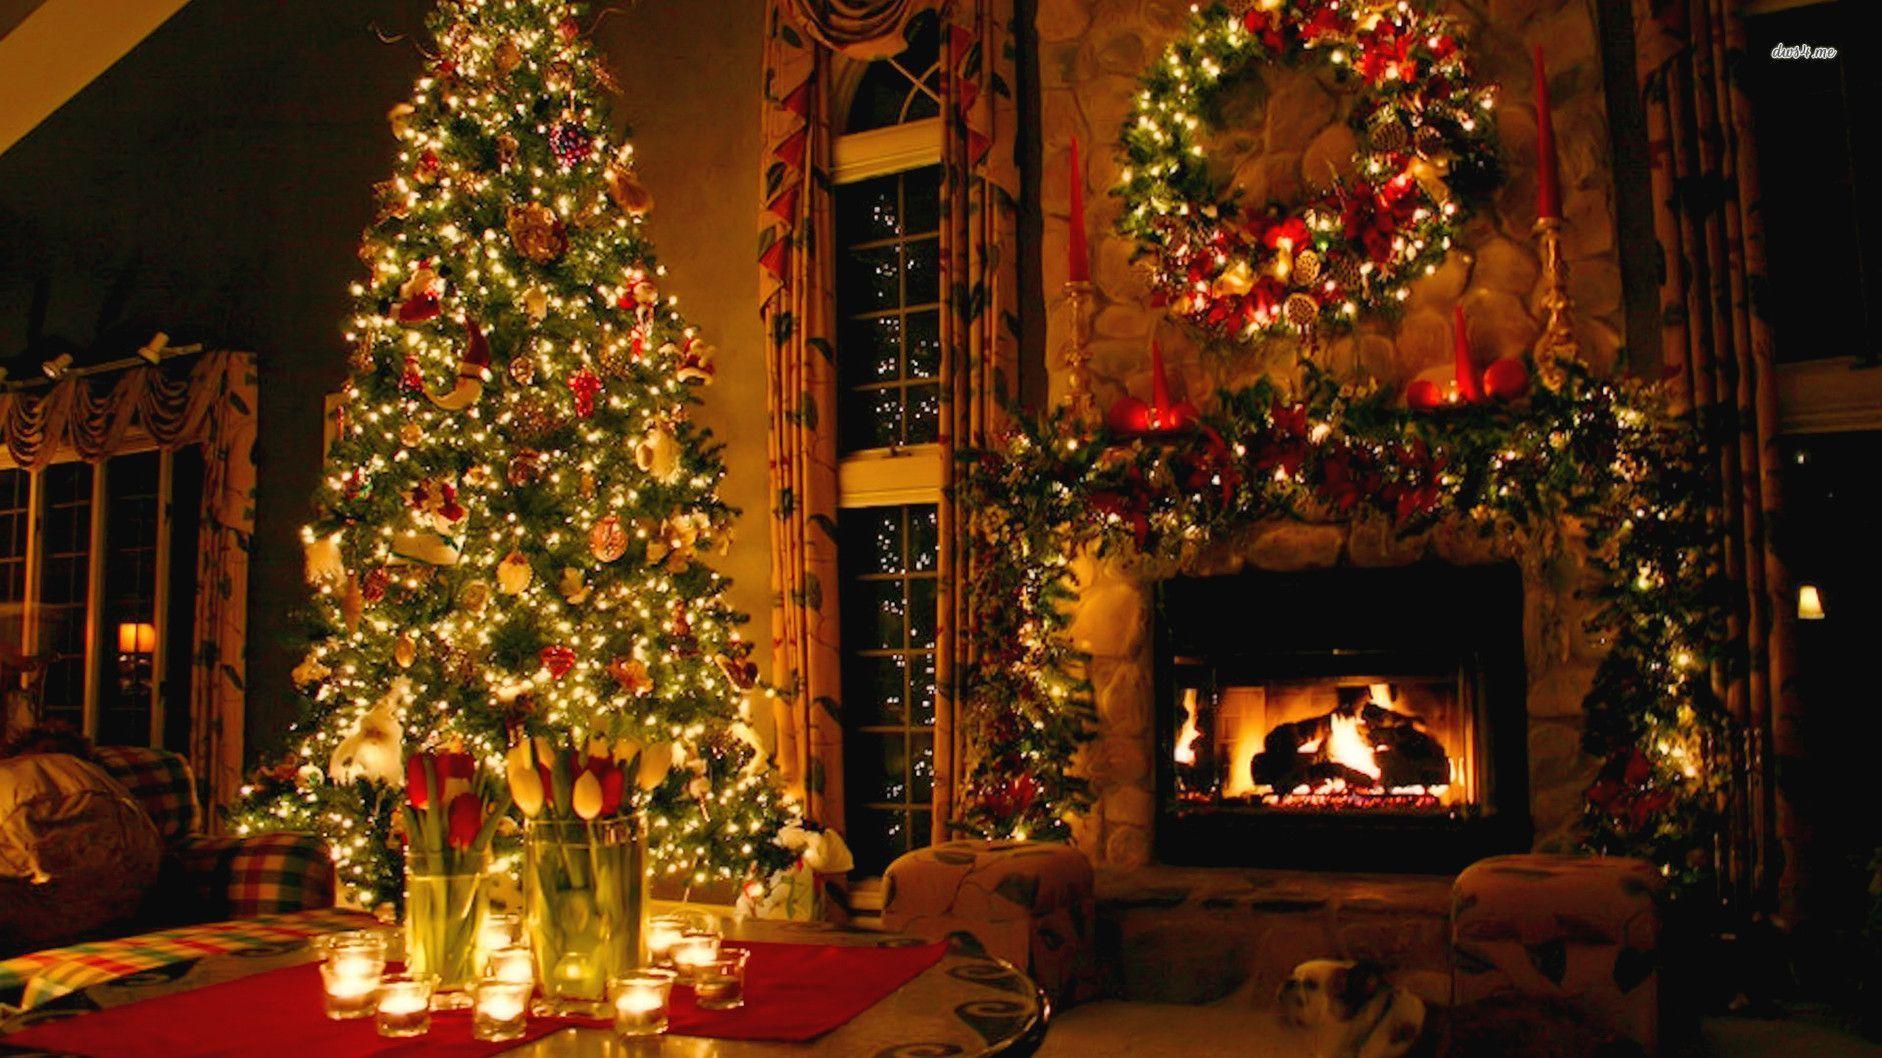 Christmas Fireplace Backgrounds 1882x1058